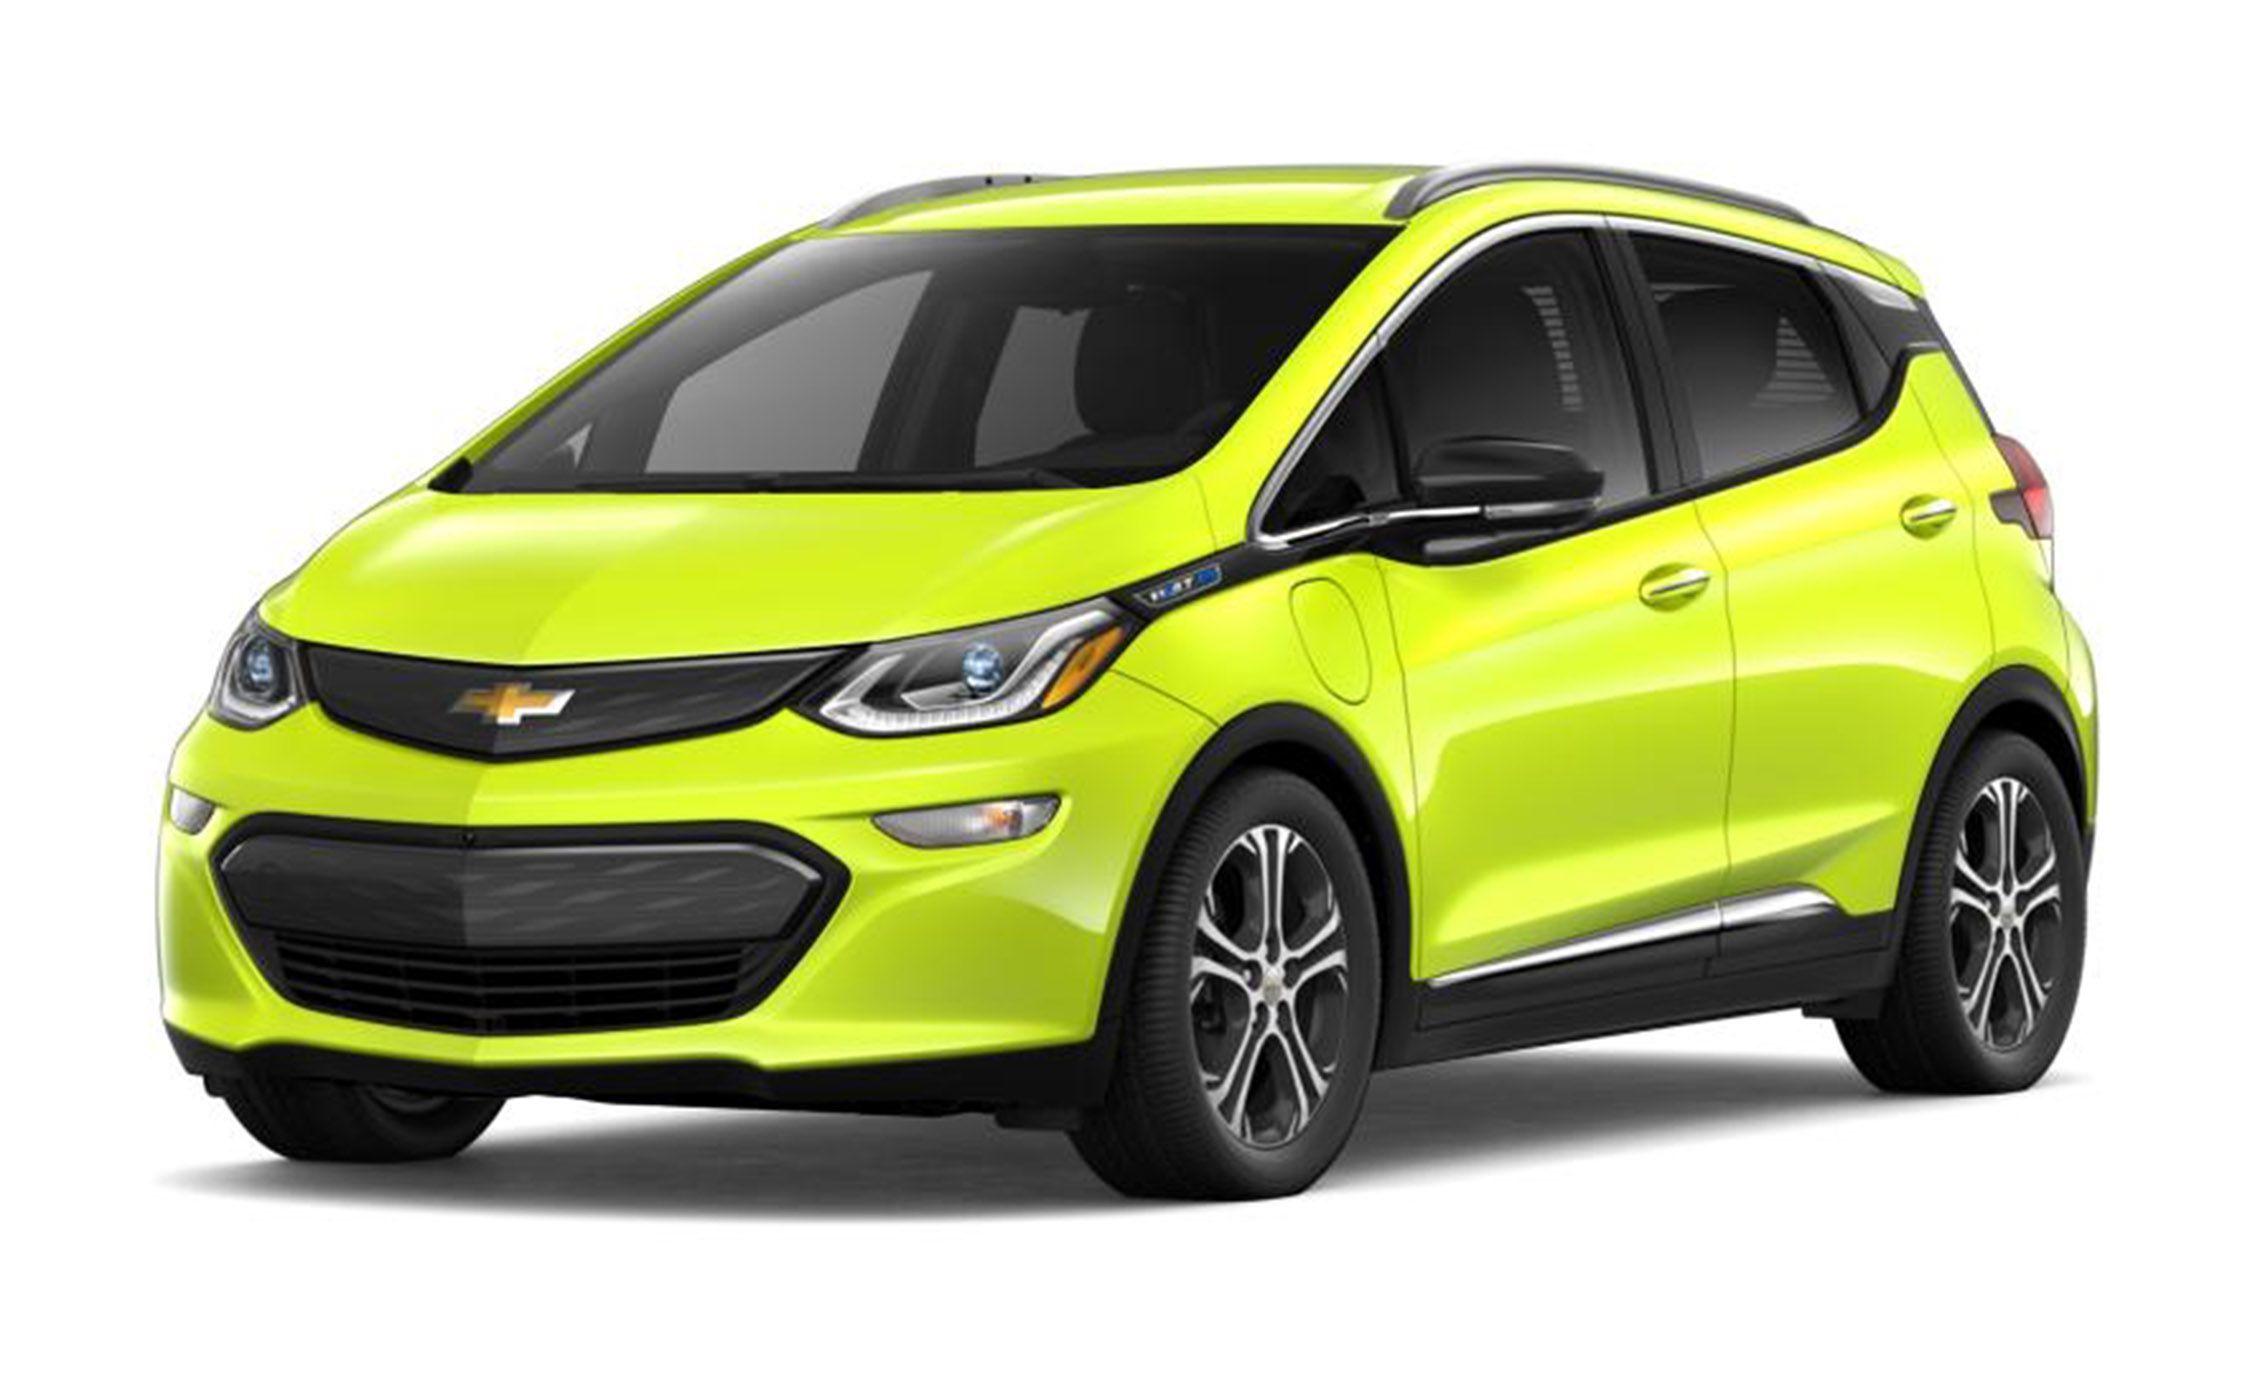 Best Subcompact Cars 2020 17 Best Hatchbacks of 2019   Top Hatchback Cars